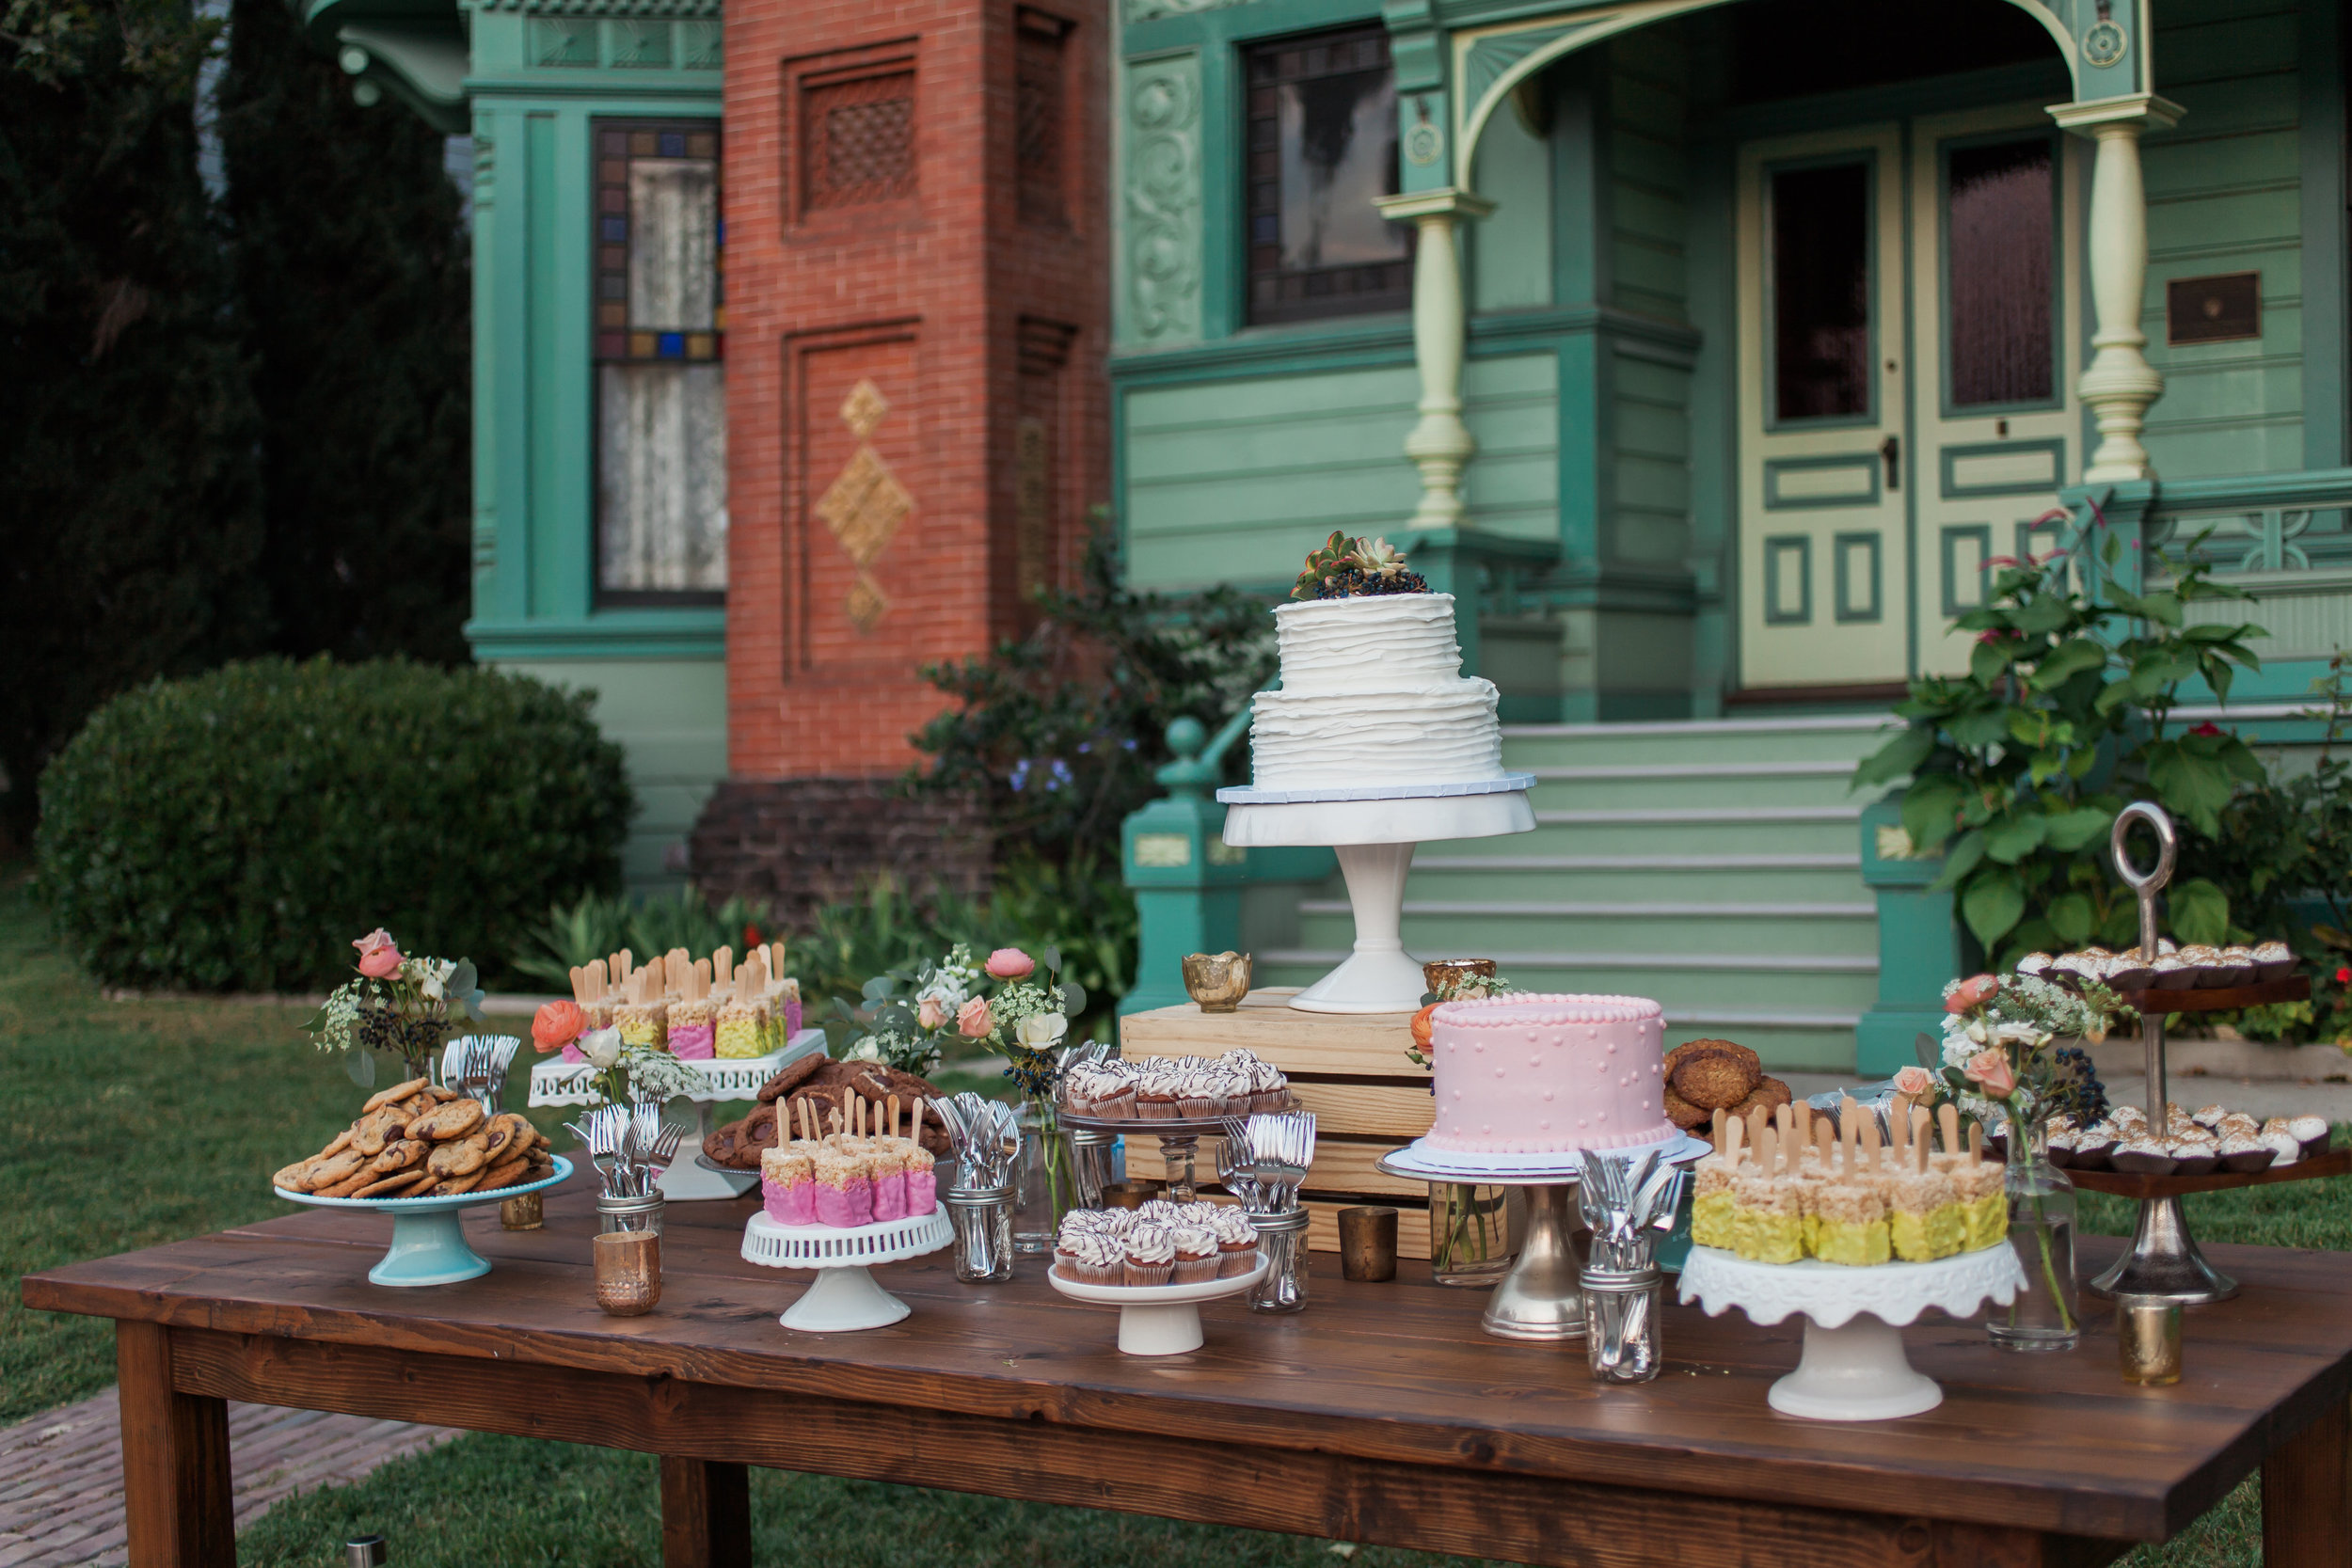 Dessert Table & Decor